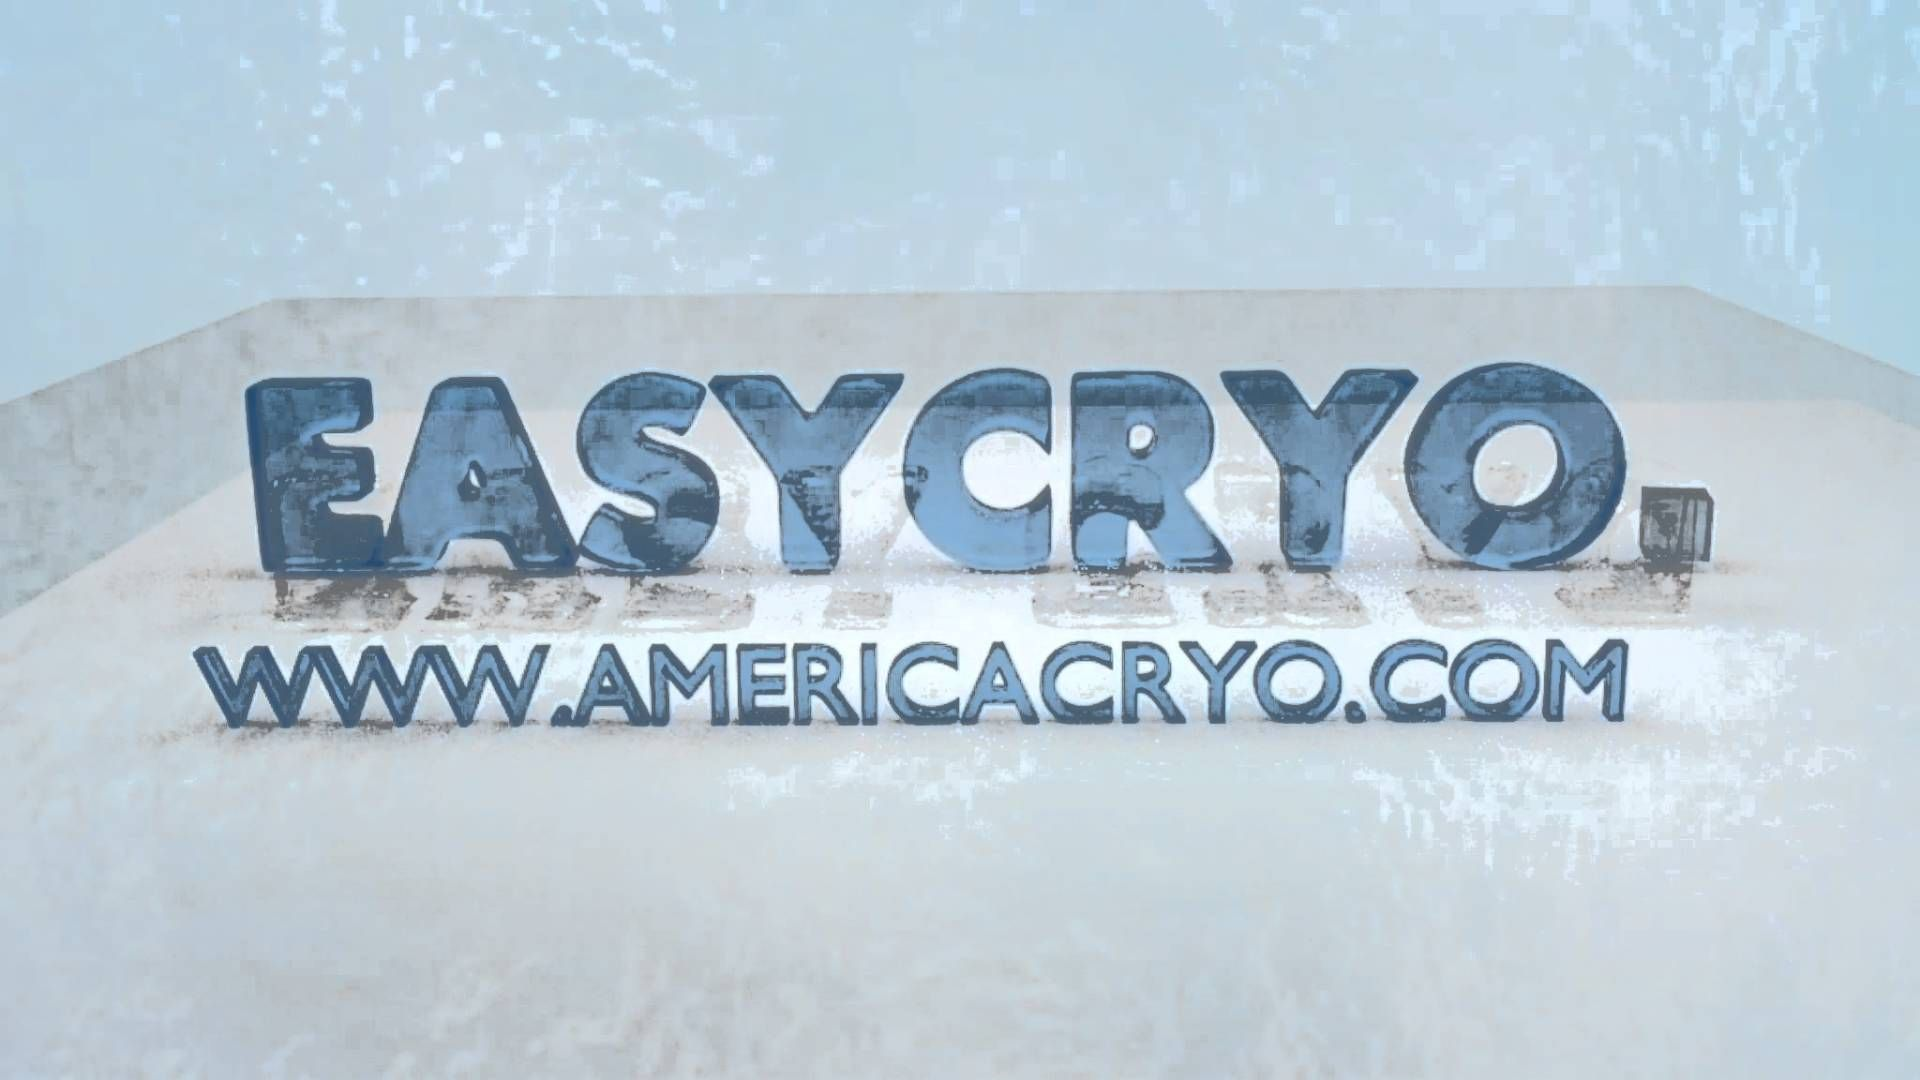 Easy cryo america cold compression youtube america